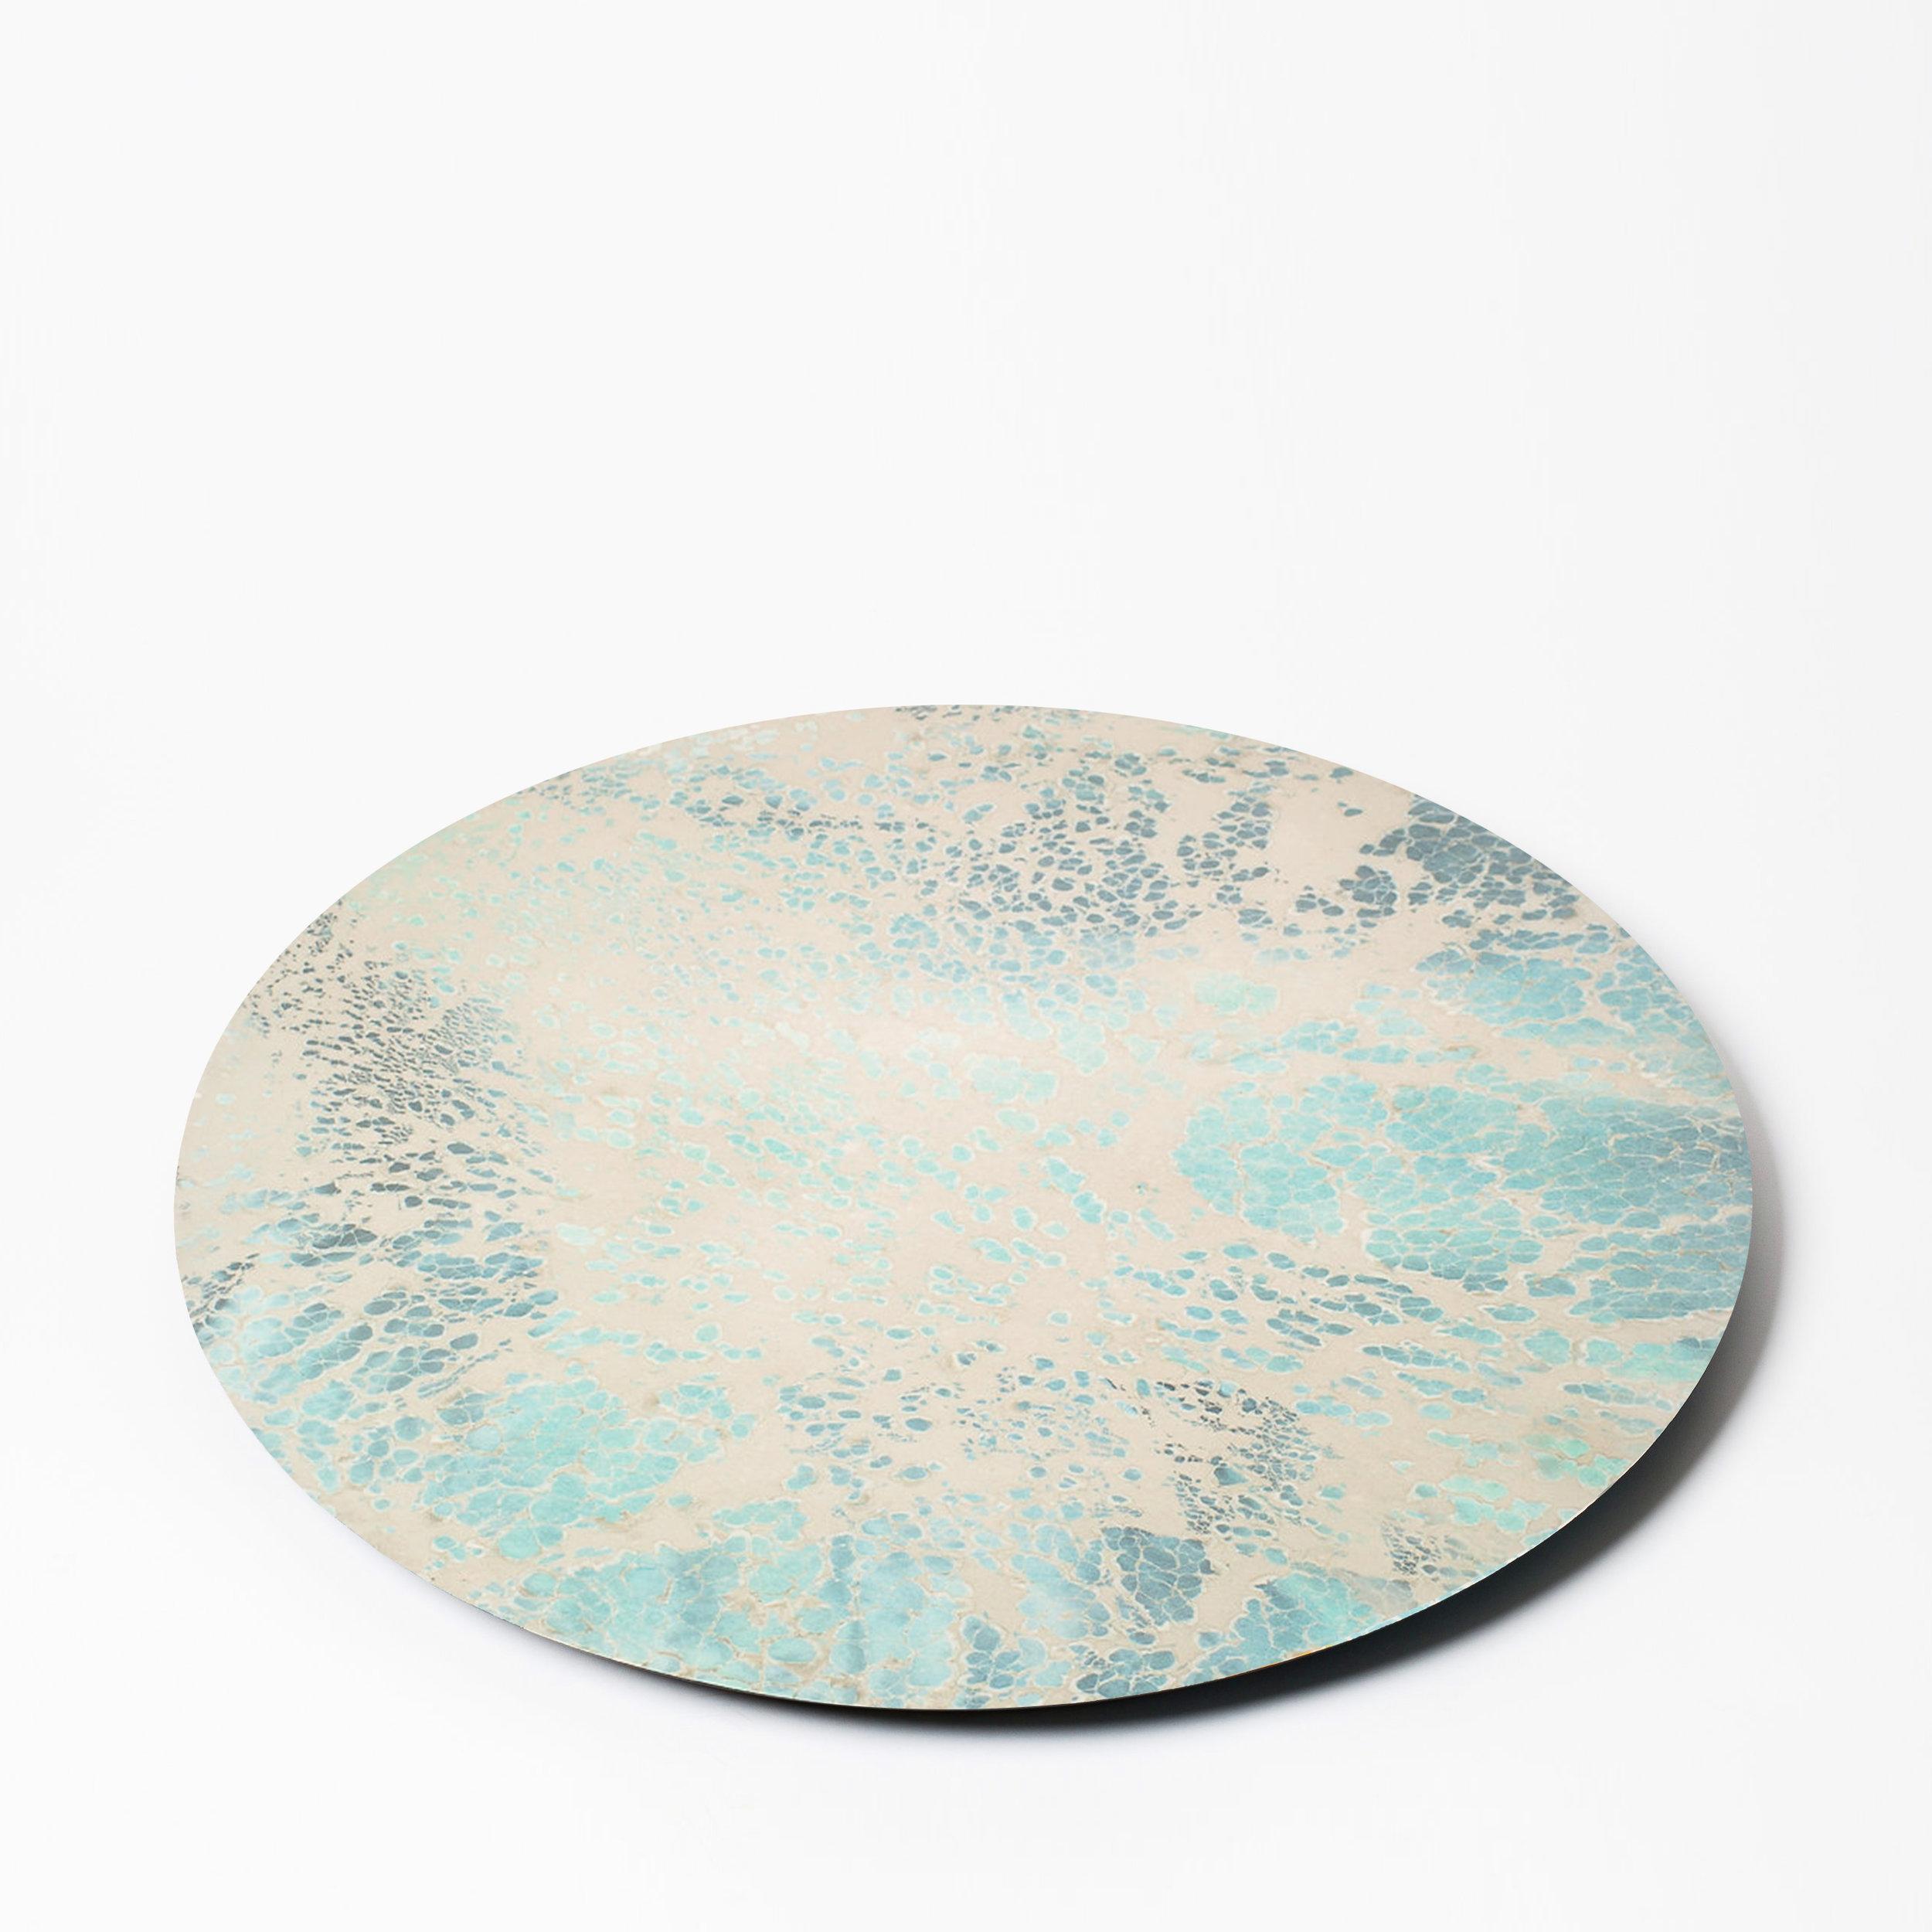 "LAMINATE LAZY SUZAN  23.5"" D  Blue & grey"